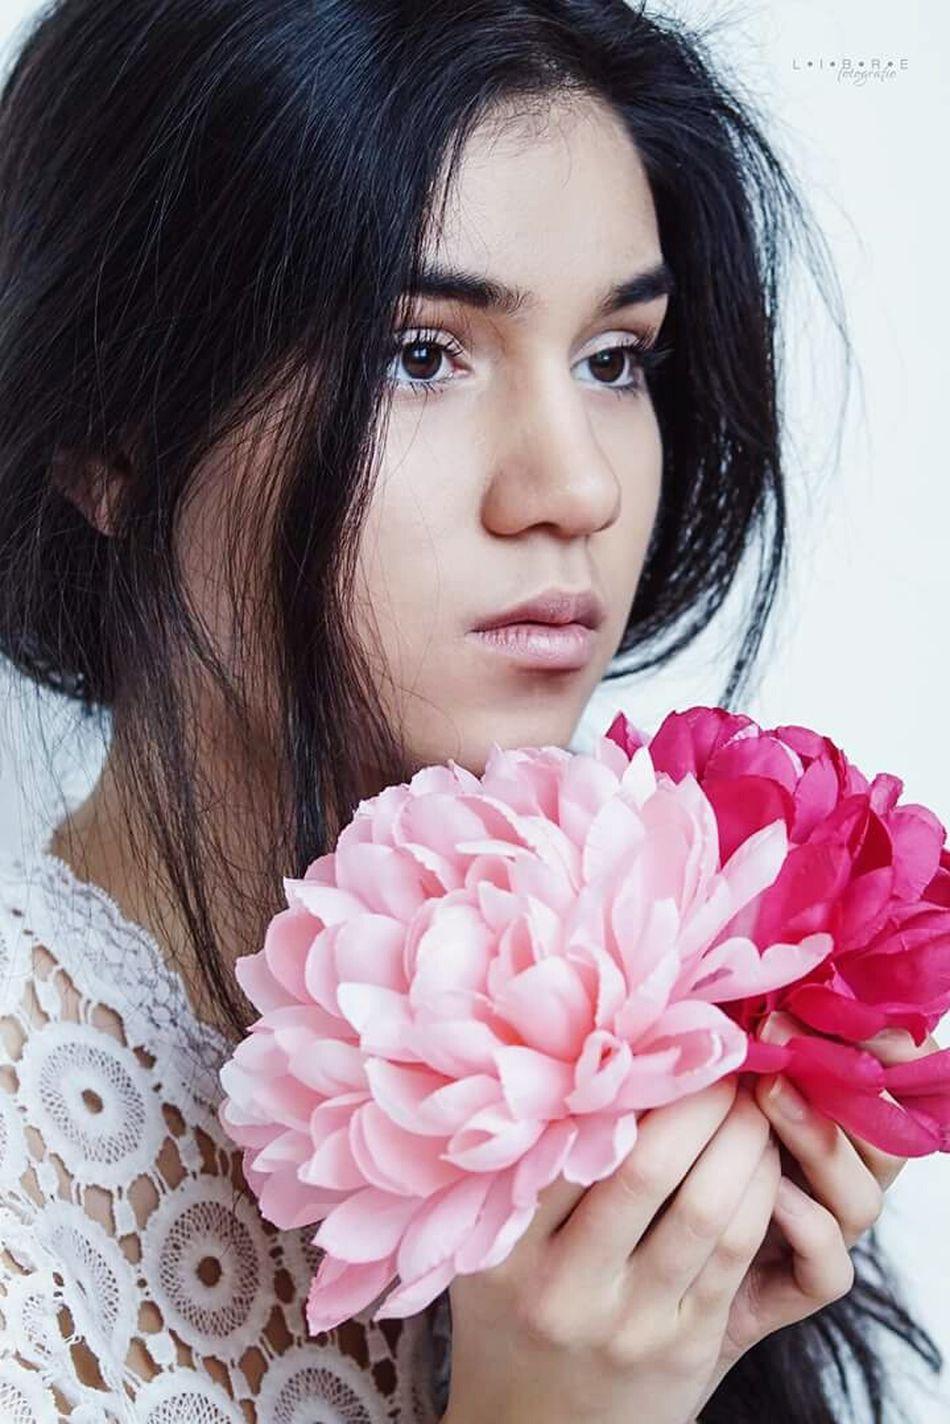 She blooms 🌷🌸🌹 Myra. I Portrait Beauty Beautyphotography Portrait Of A Woman Flower Taking Photos Spring People Photography People Of EyeEm Librefotografie Bonn Köln Cologne